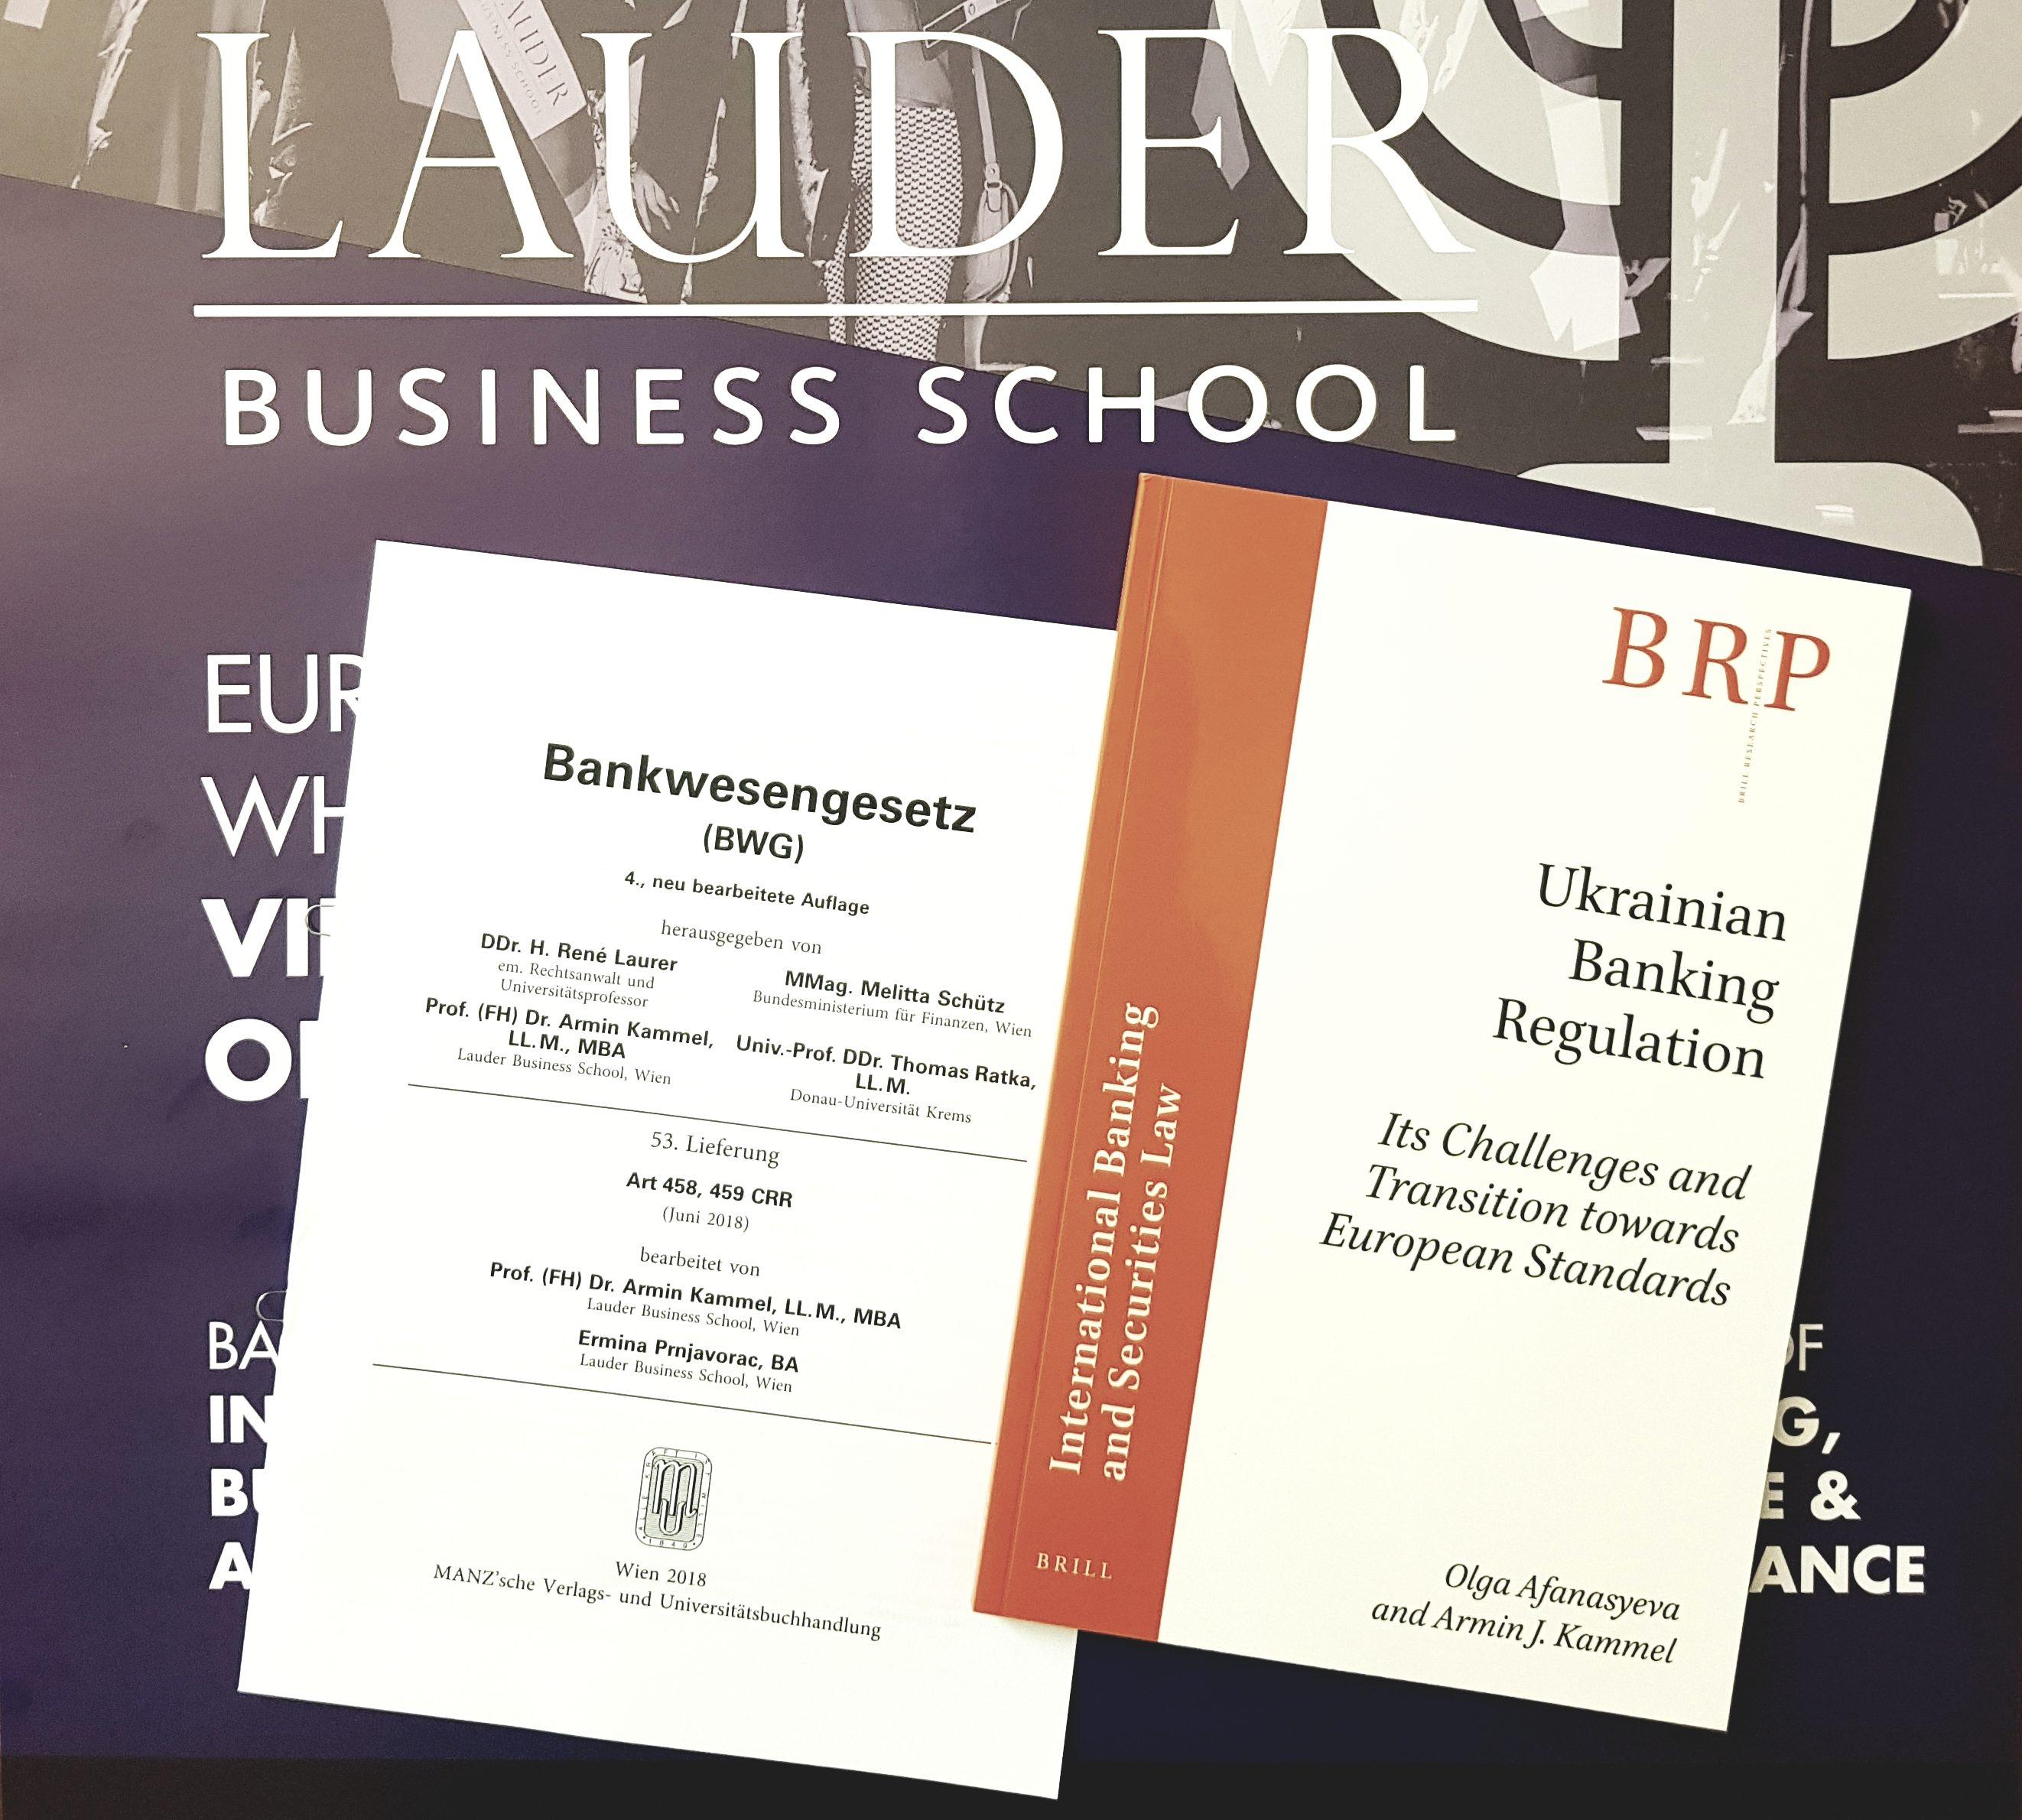 BWG & BRP vol. on Ukrainian Banking Regulation